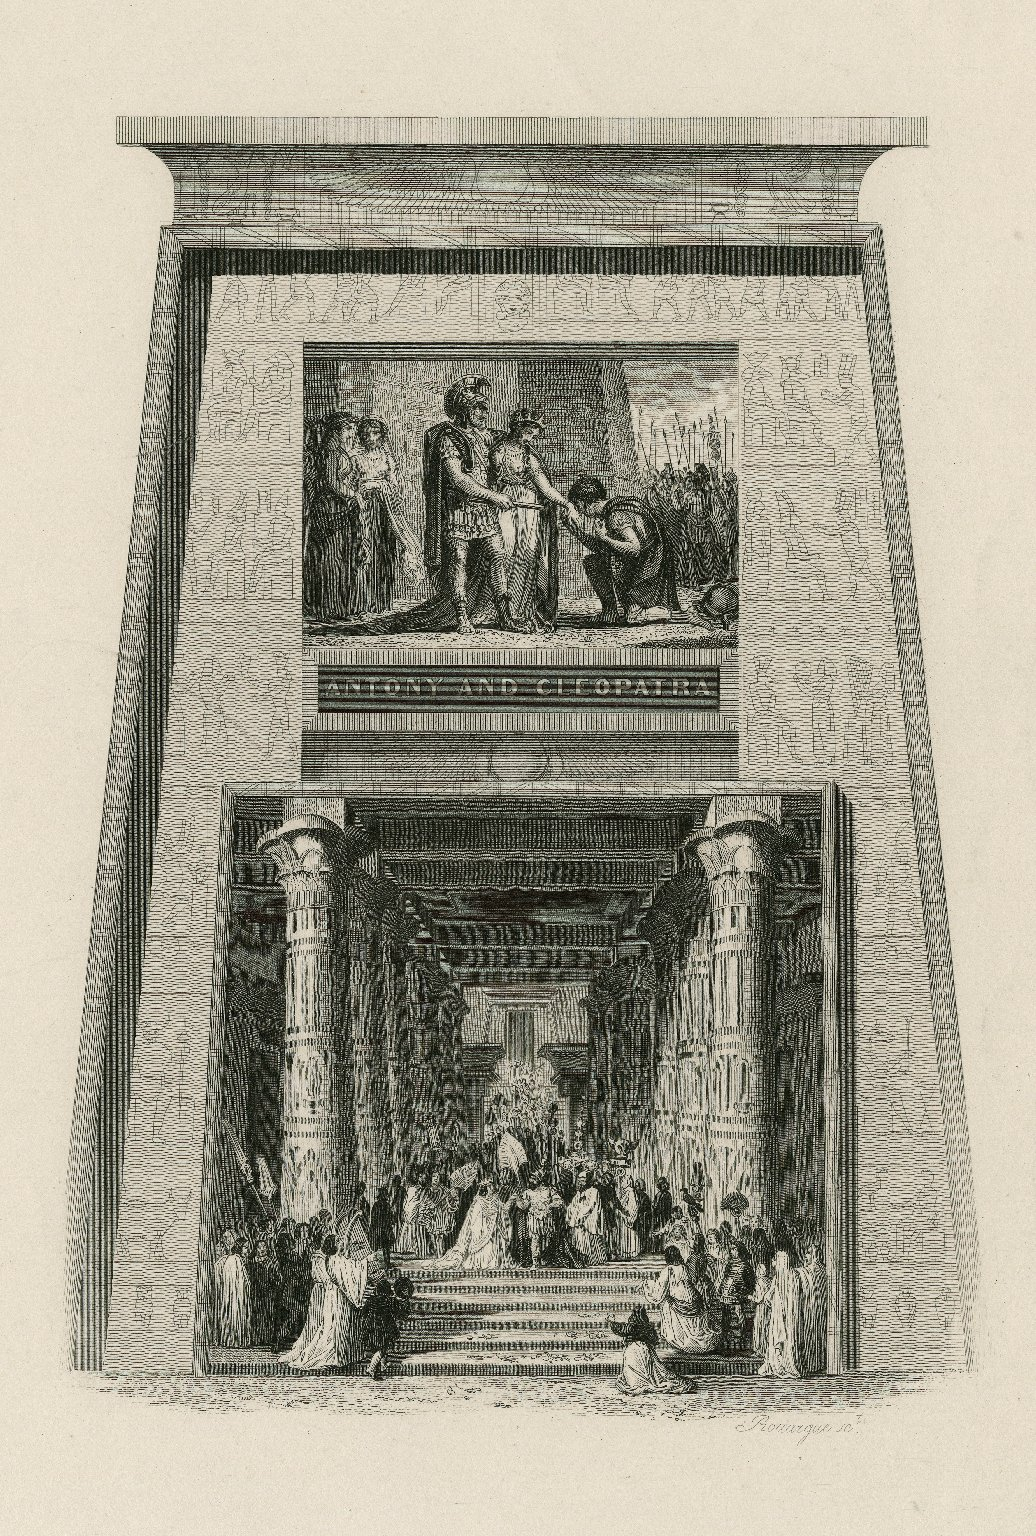 Antony and Cleopatra [graphic] / Rouargue, sct.